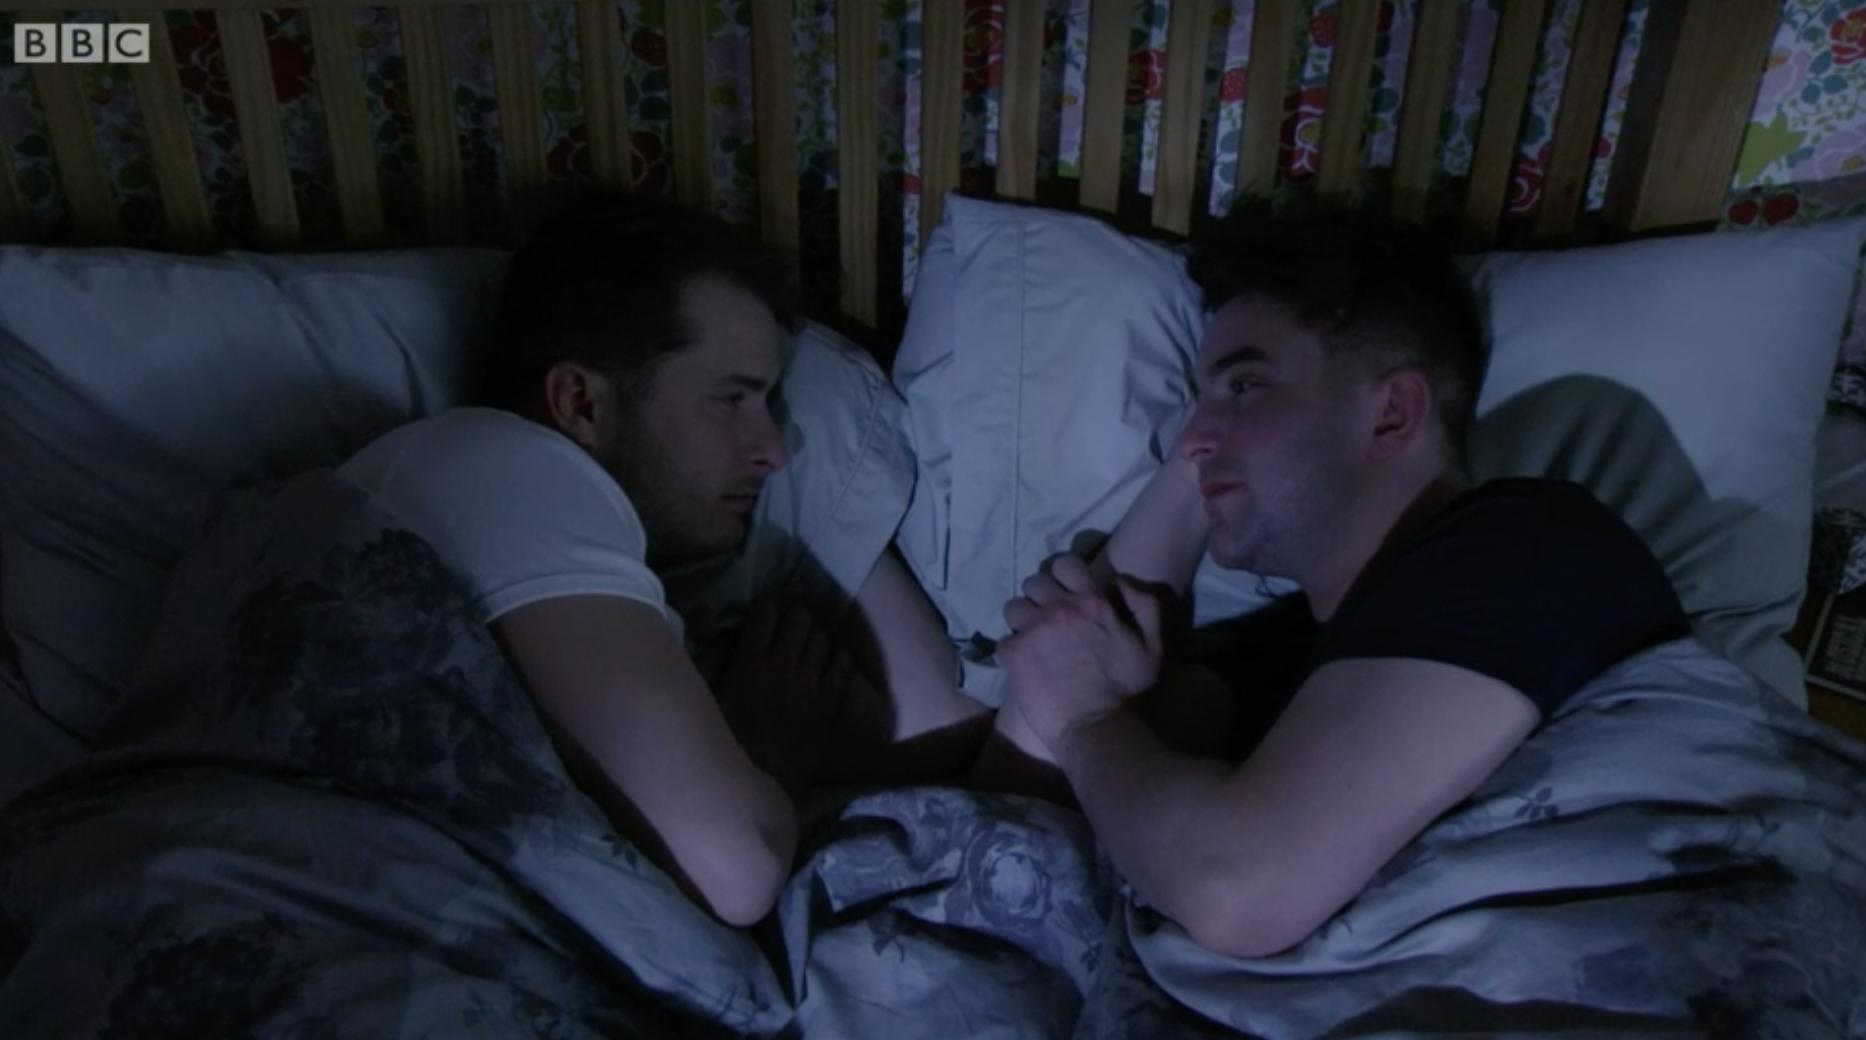 Ben y Callum EastEnders BBC